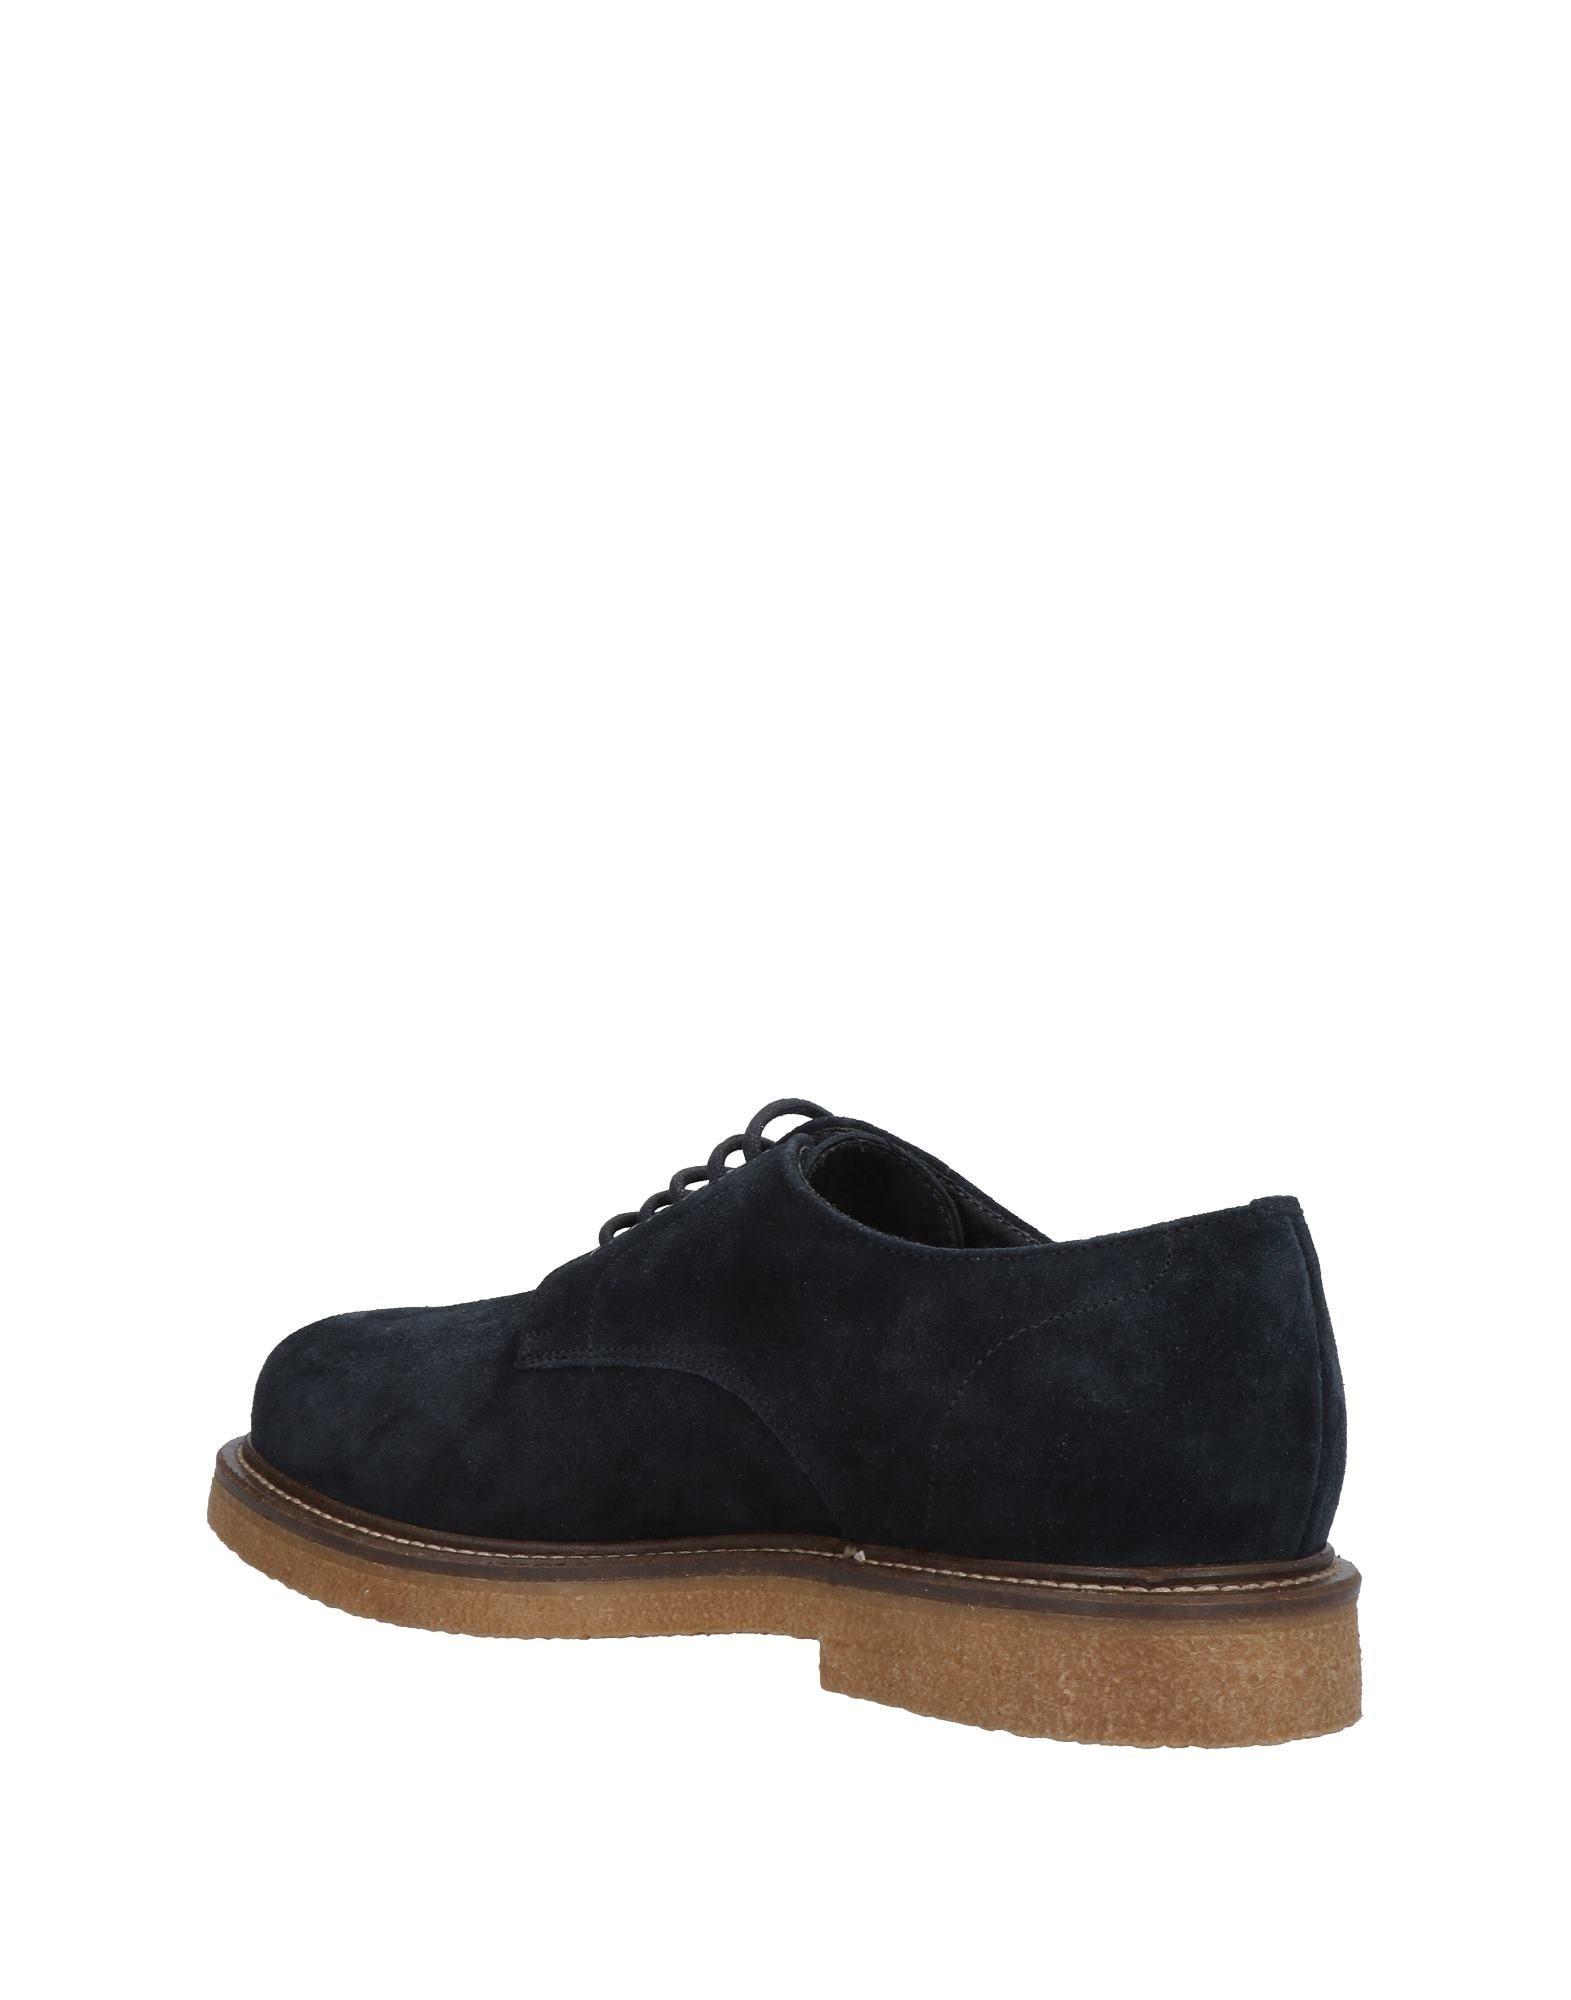 Rabatt echte Schuhe Frau Schnürschuhe Herren  11481714LT